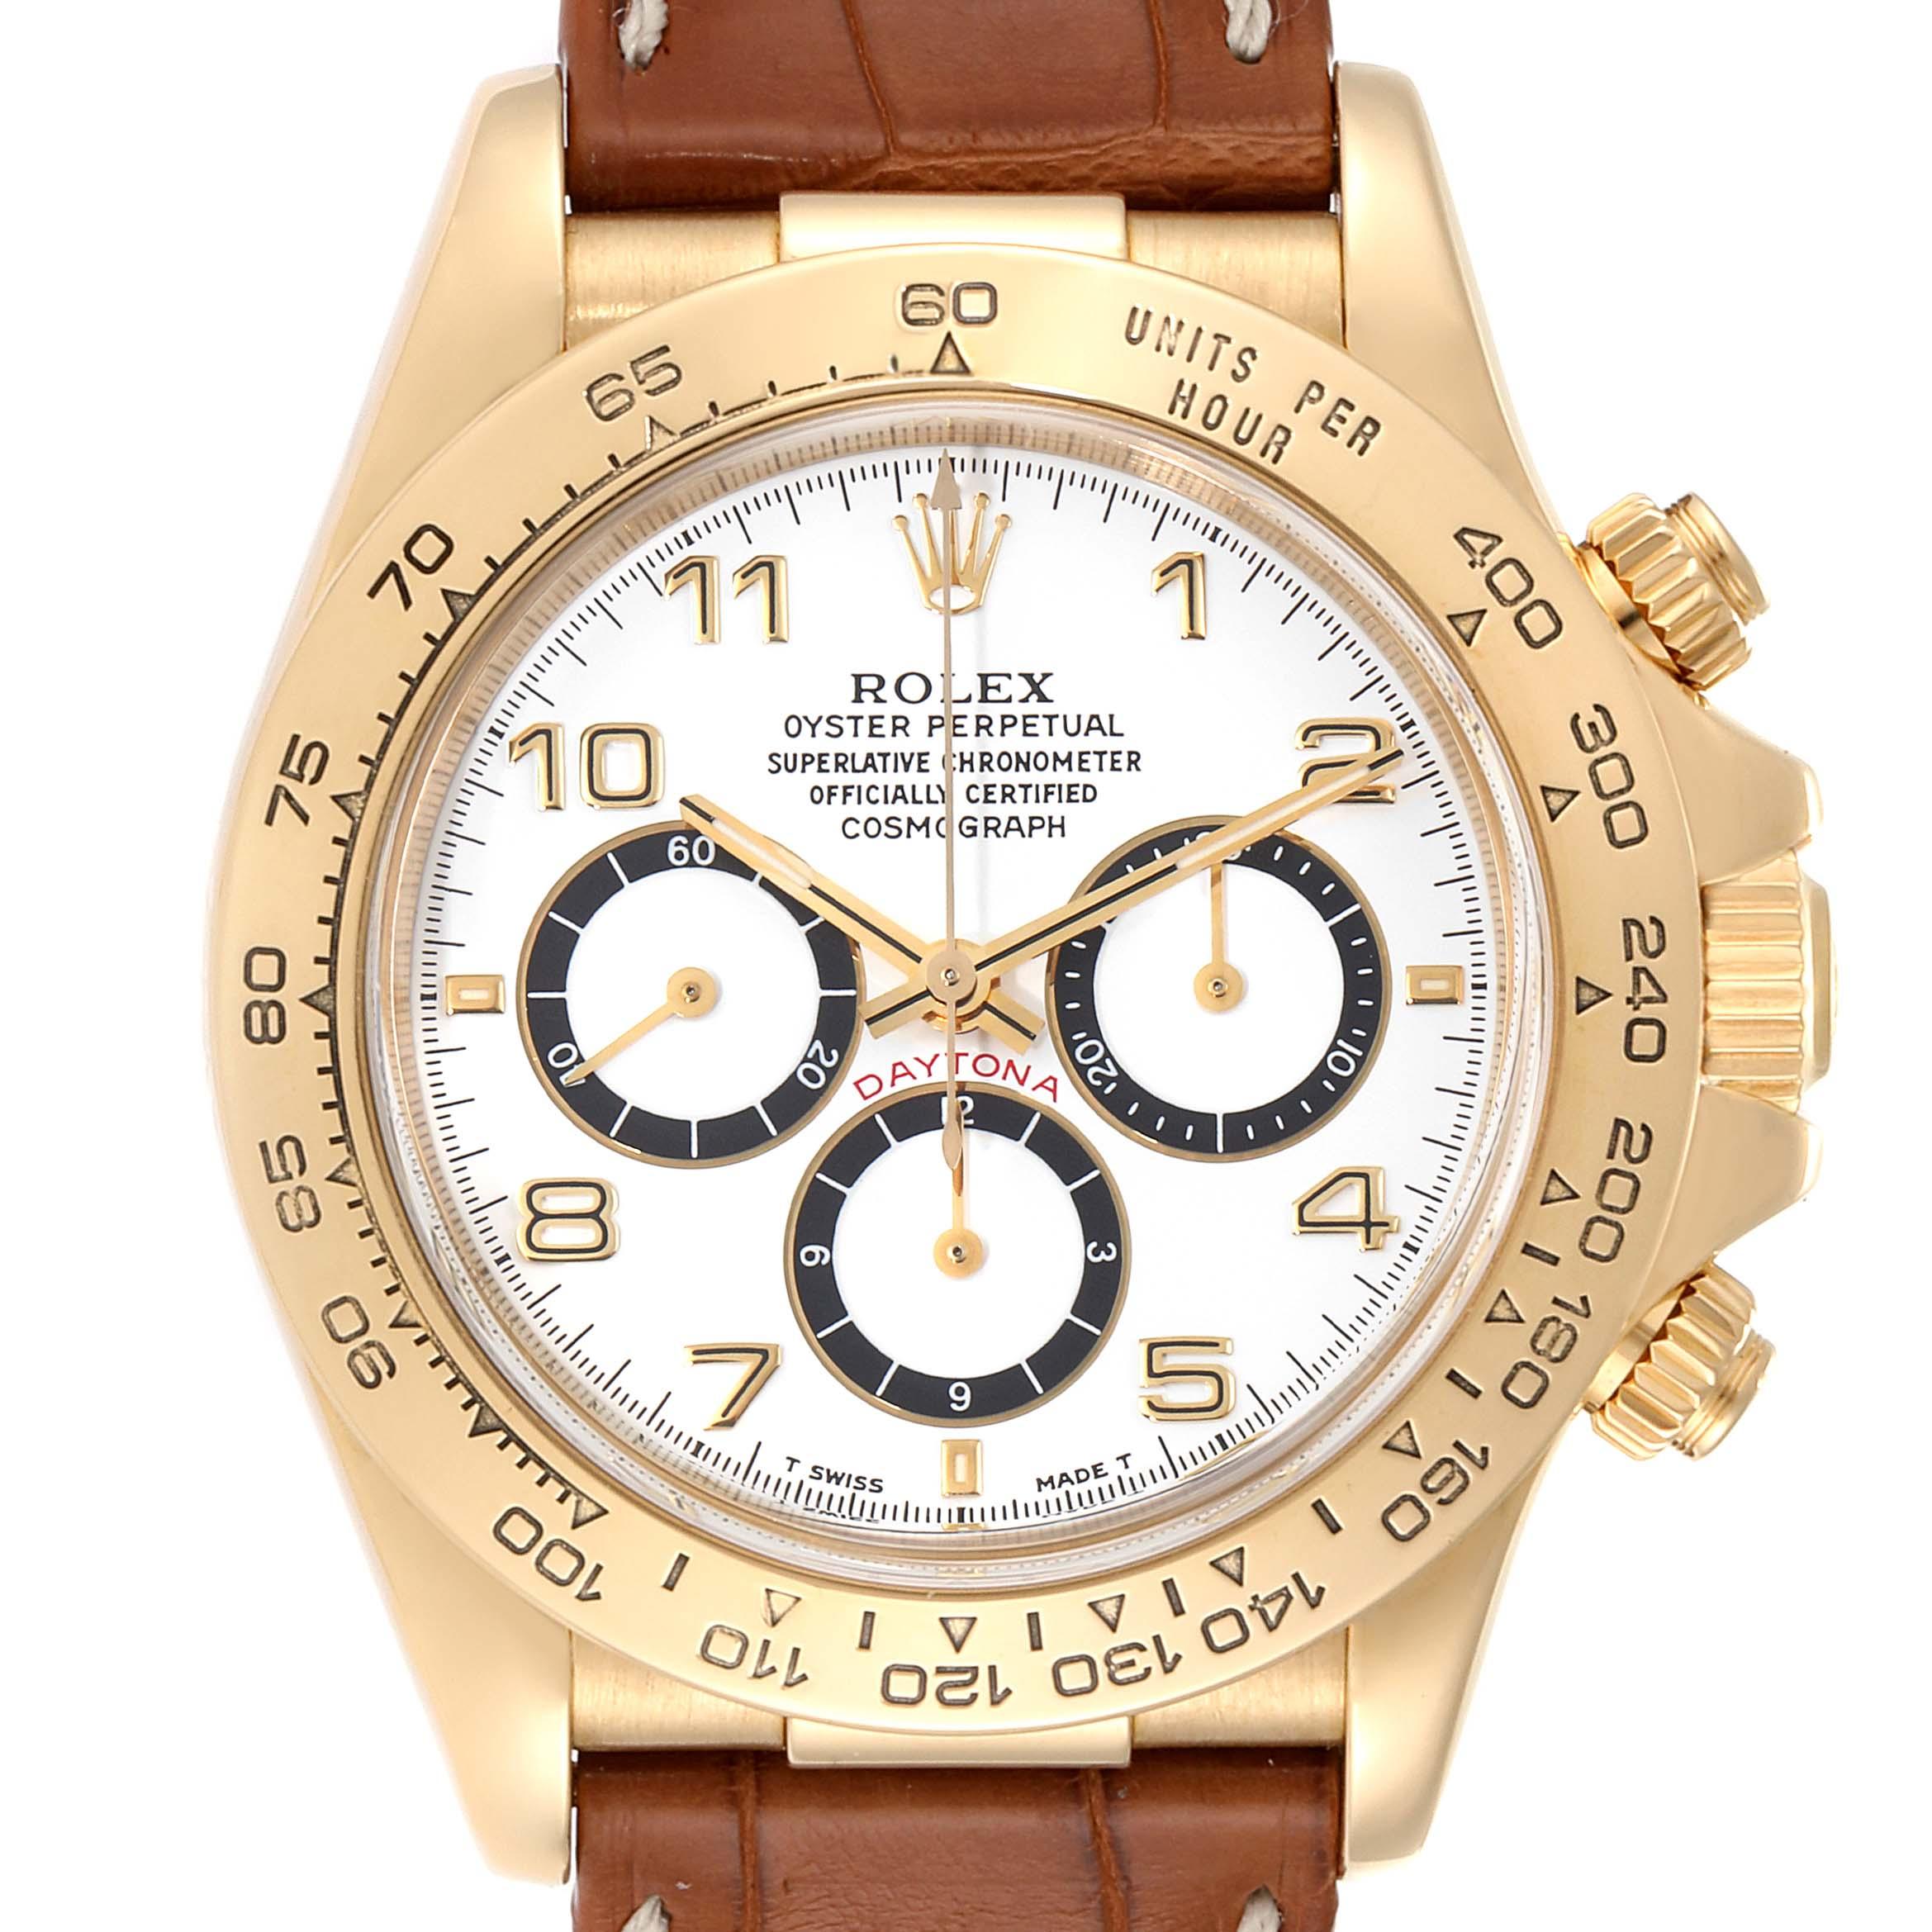 Photo of Rolex Daytona Yellow Gold White Dial Chronograph Mens Watch 16518